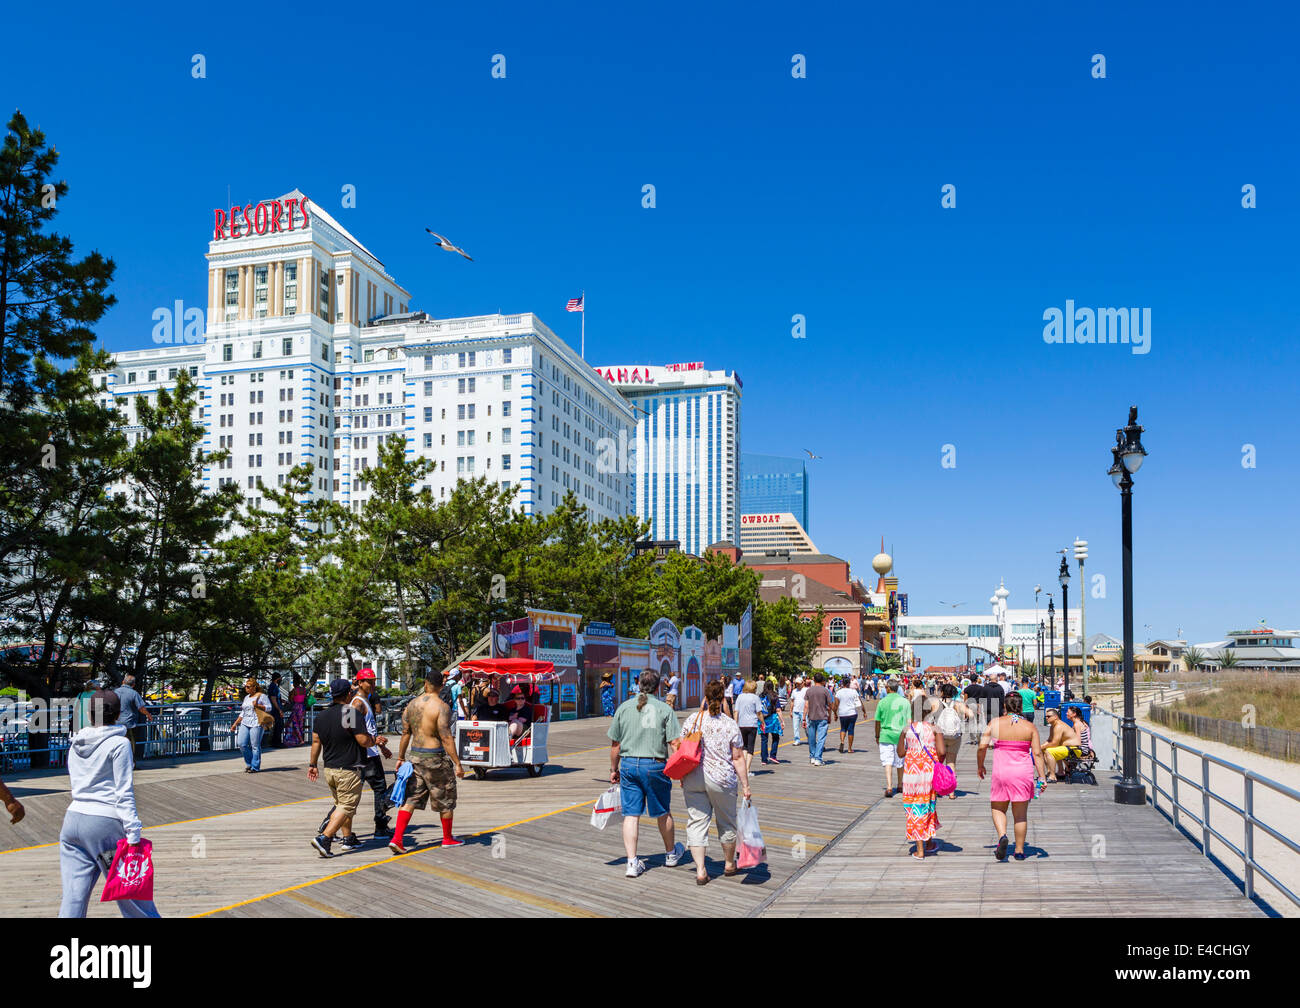 The boardwalk looking towards the Taj Mahal Casino and Steel Pier, Atlantic City, New Jersey, USA - Stock Image